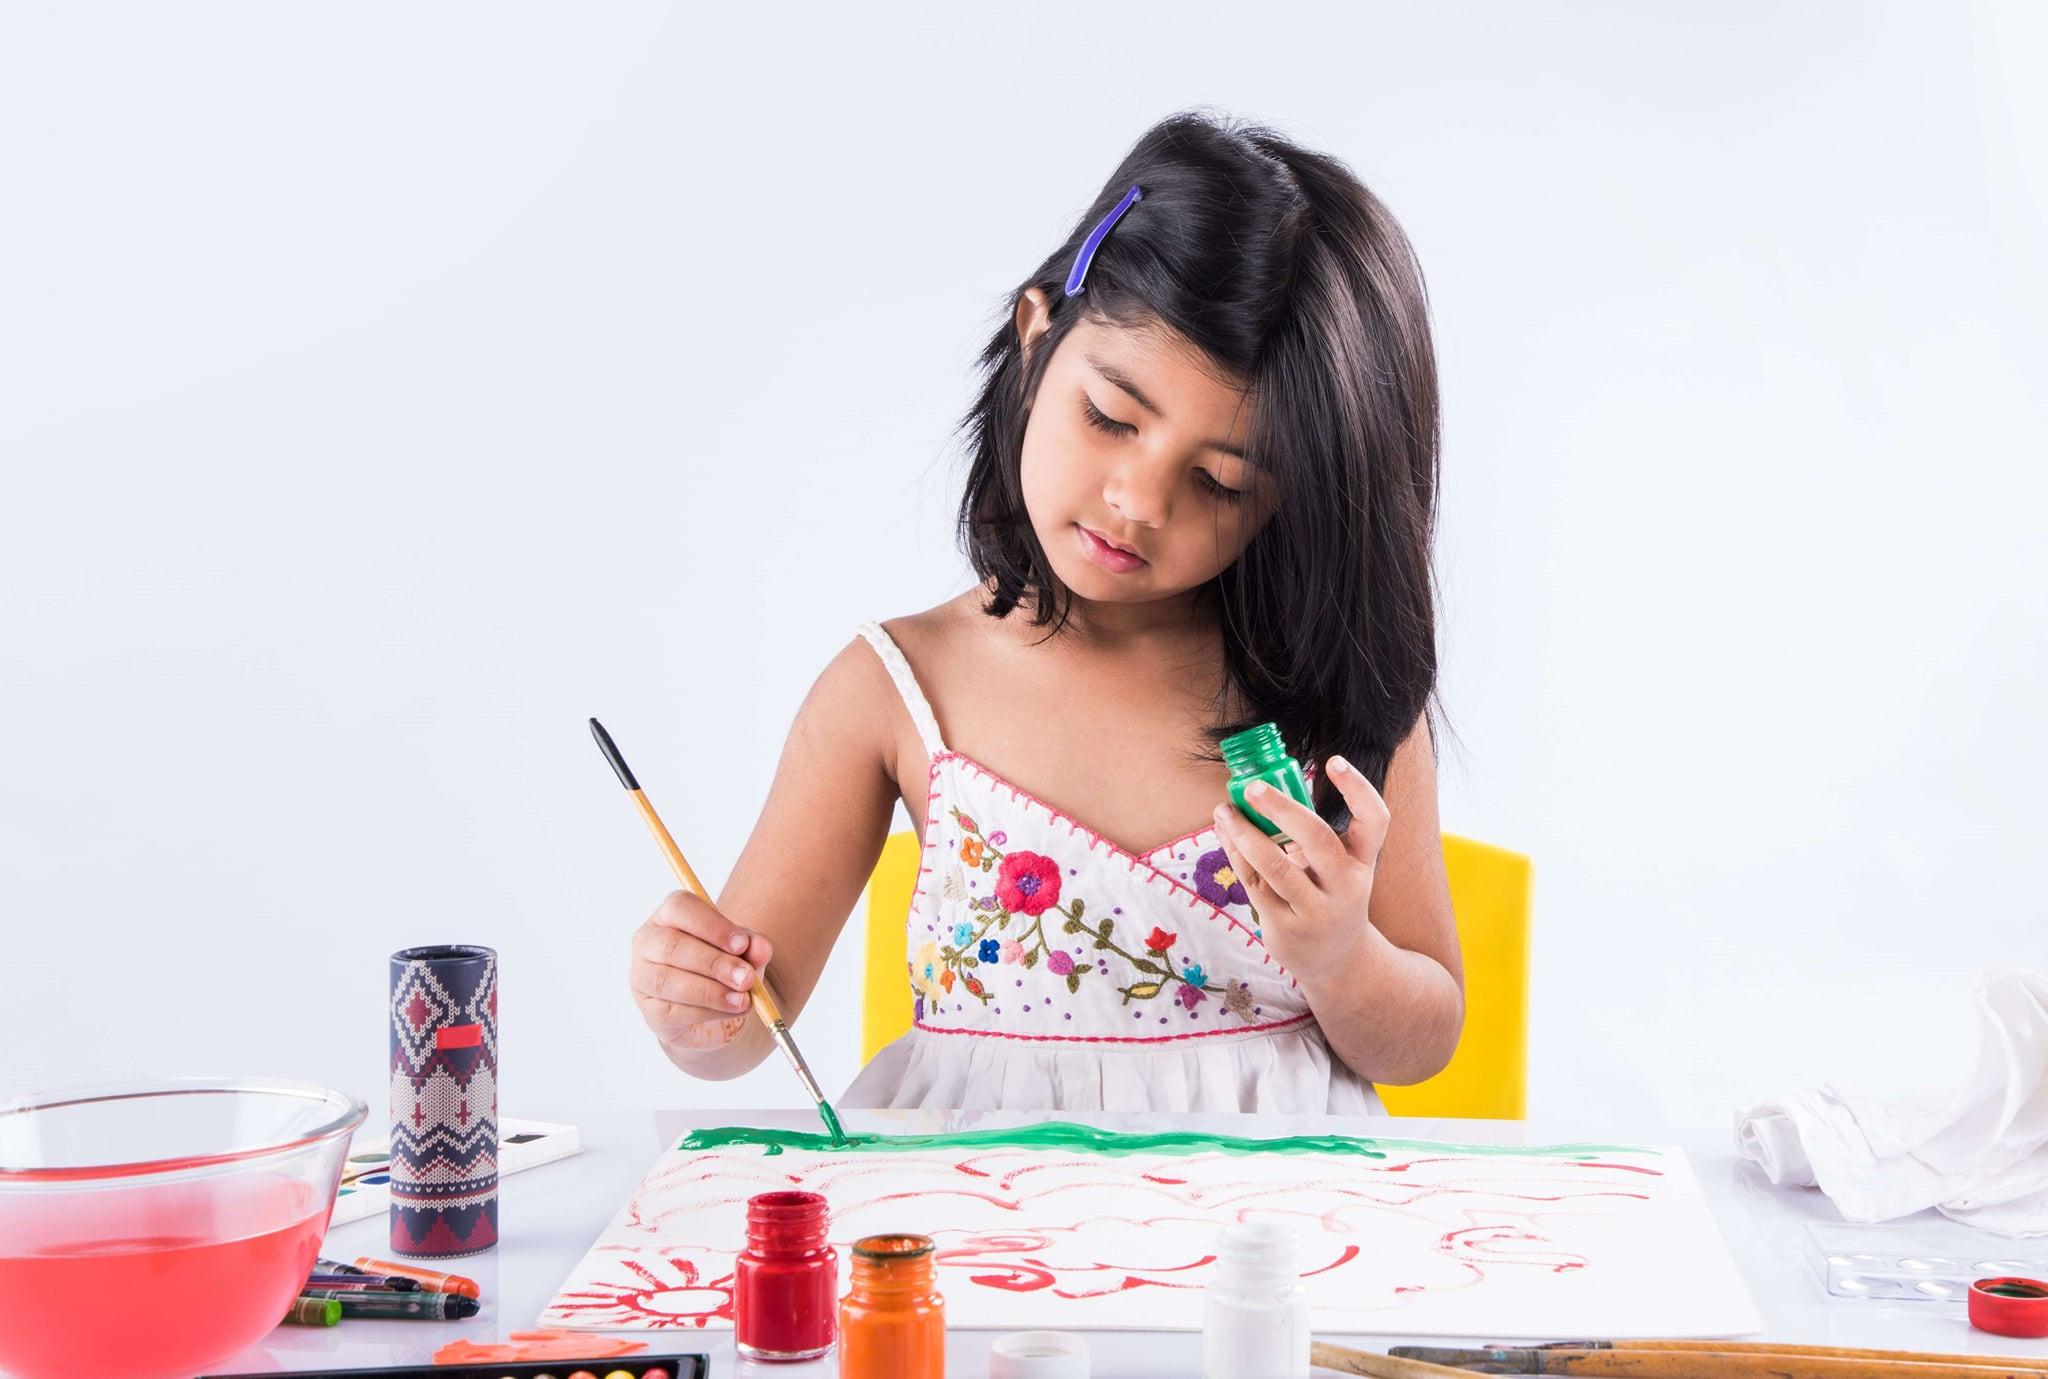 Sketching & Painting